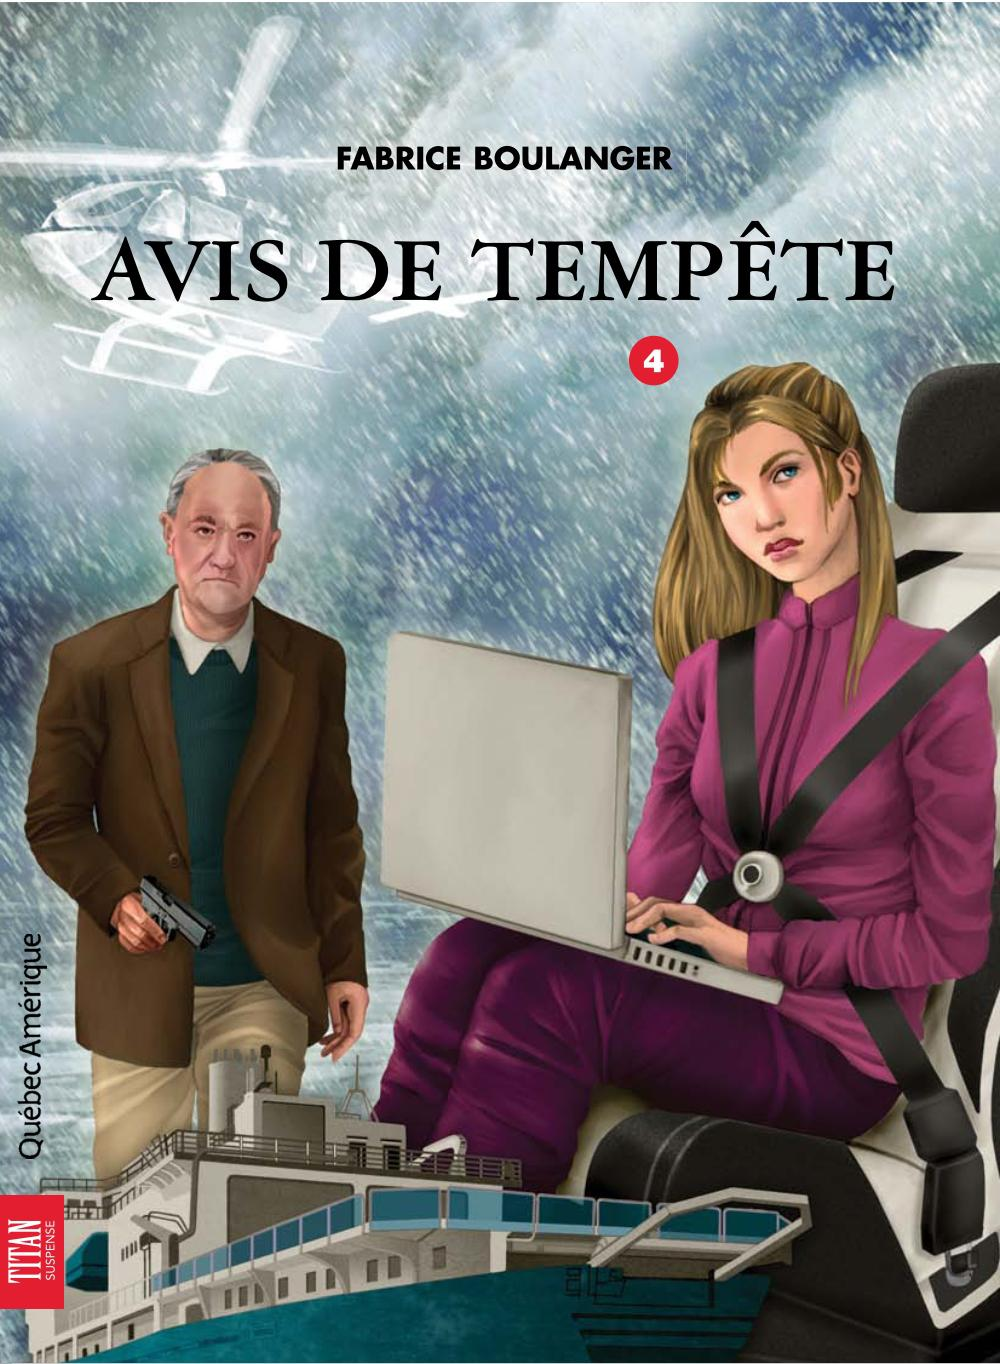 ALIBIS 4 - AVIS DE TEMPETE